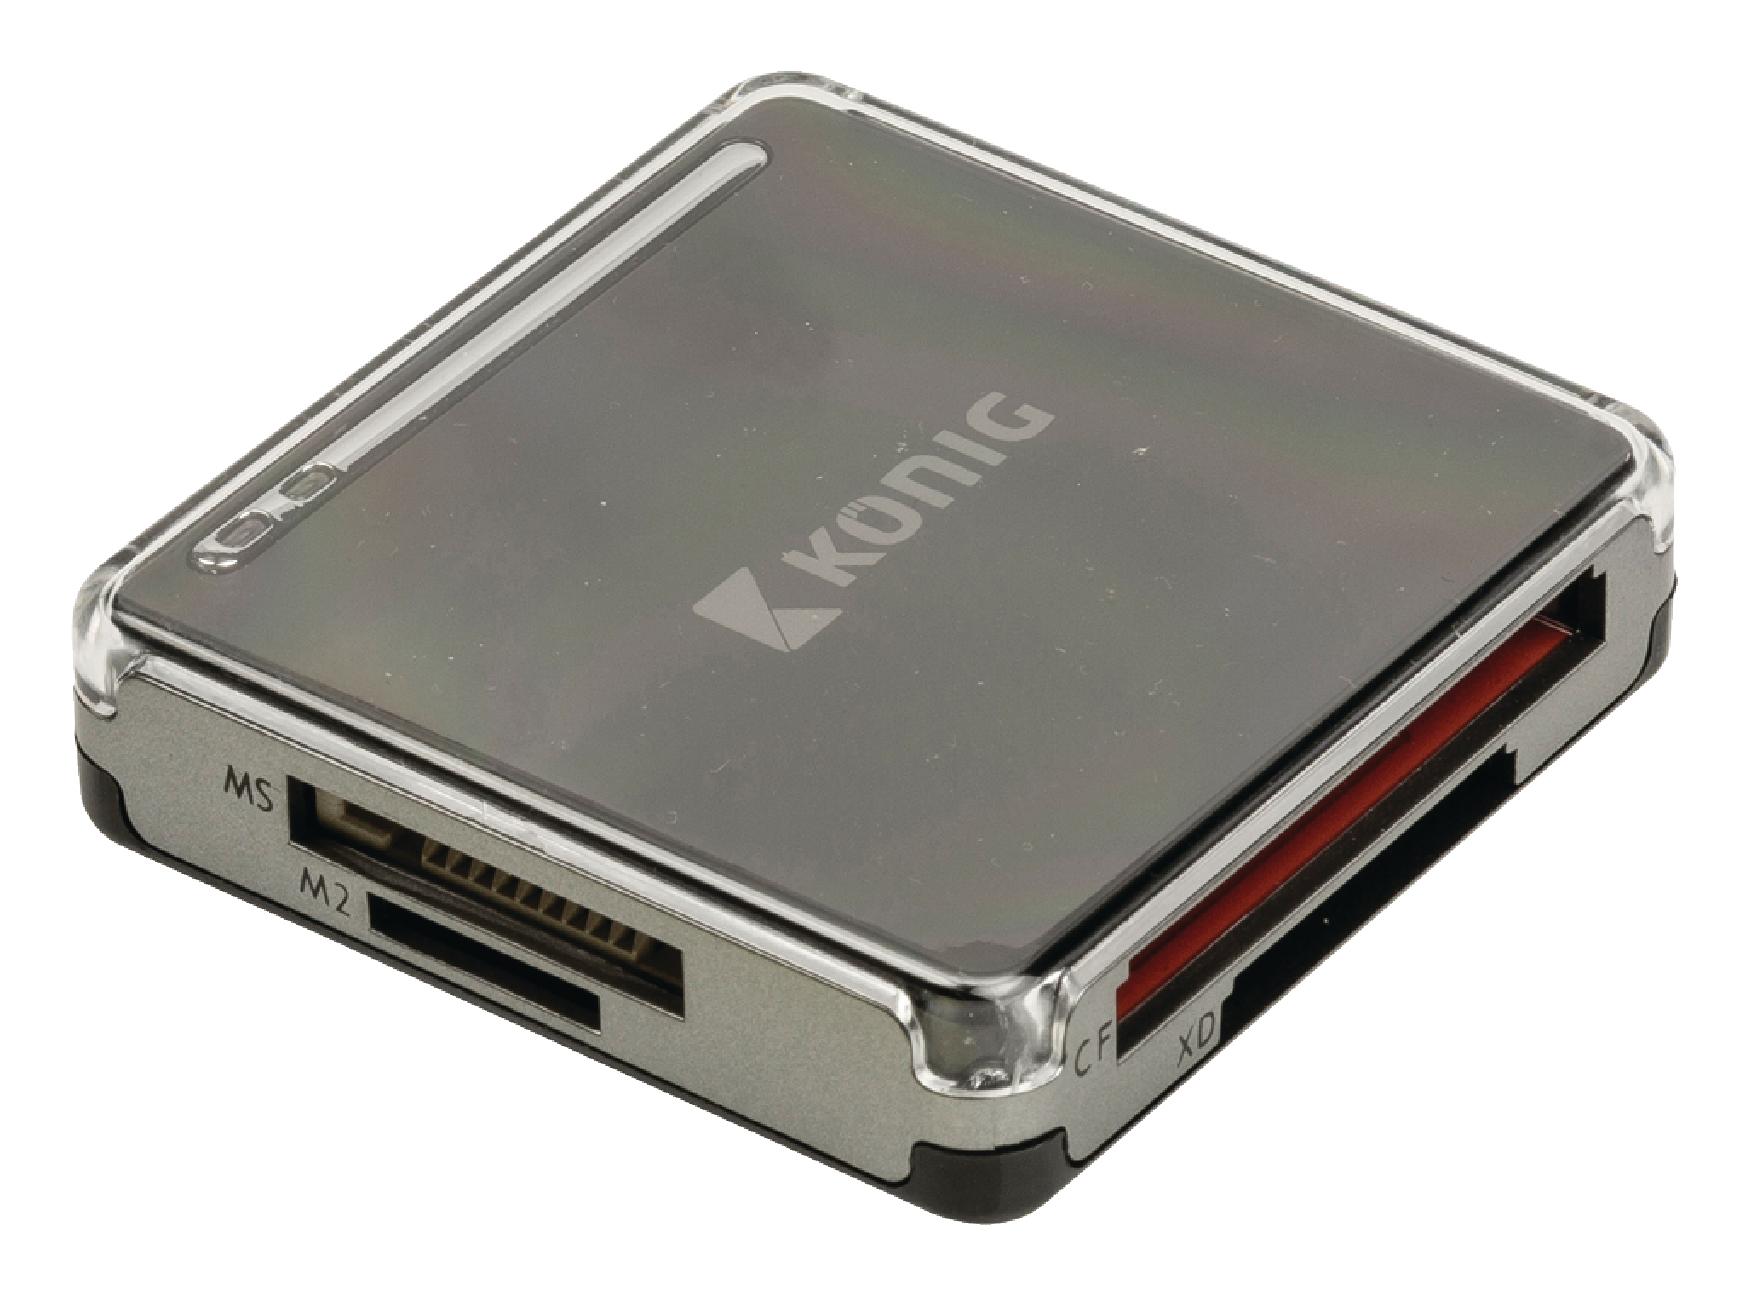 Čtečka paměťových karet multiformátová USB 2.0, König CSU2ACR100Br